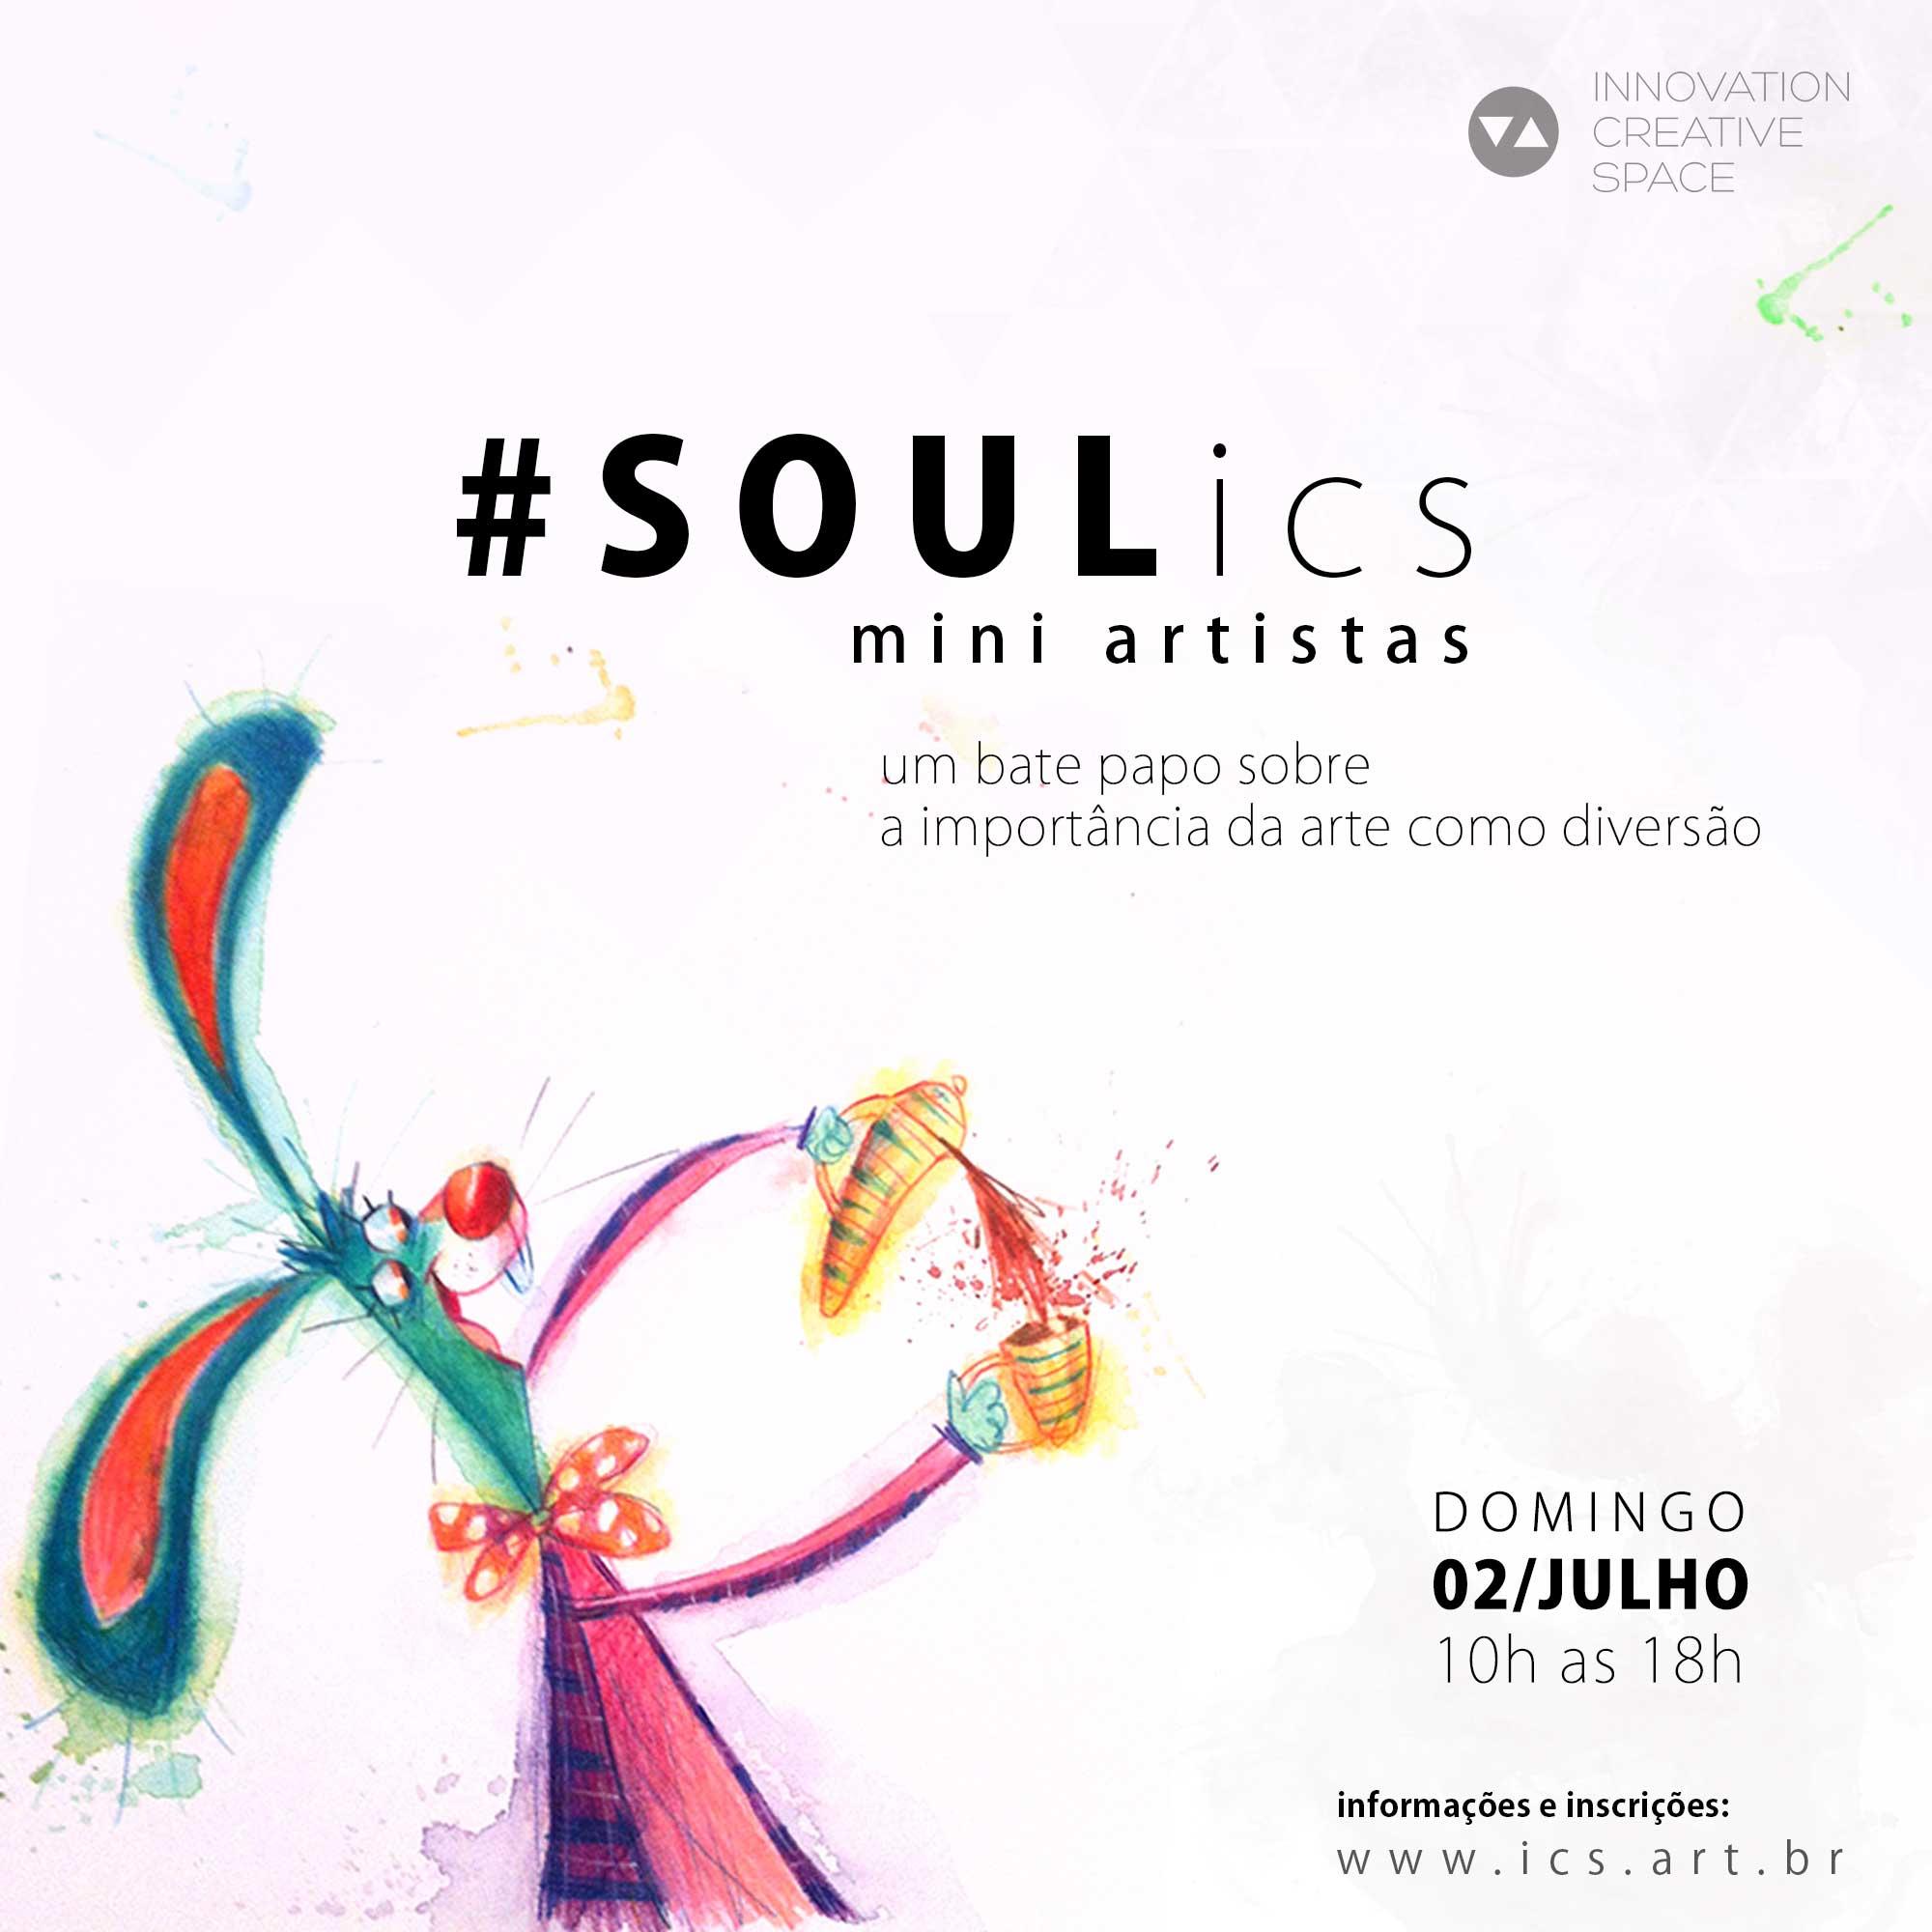 2017-07-02-SOULics11_MINIARTISTAS